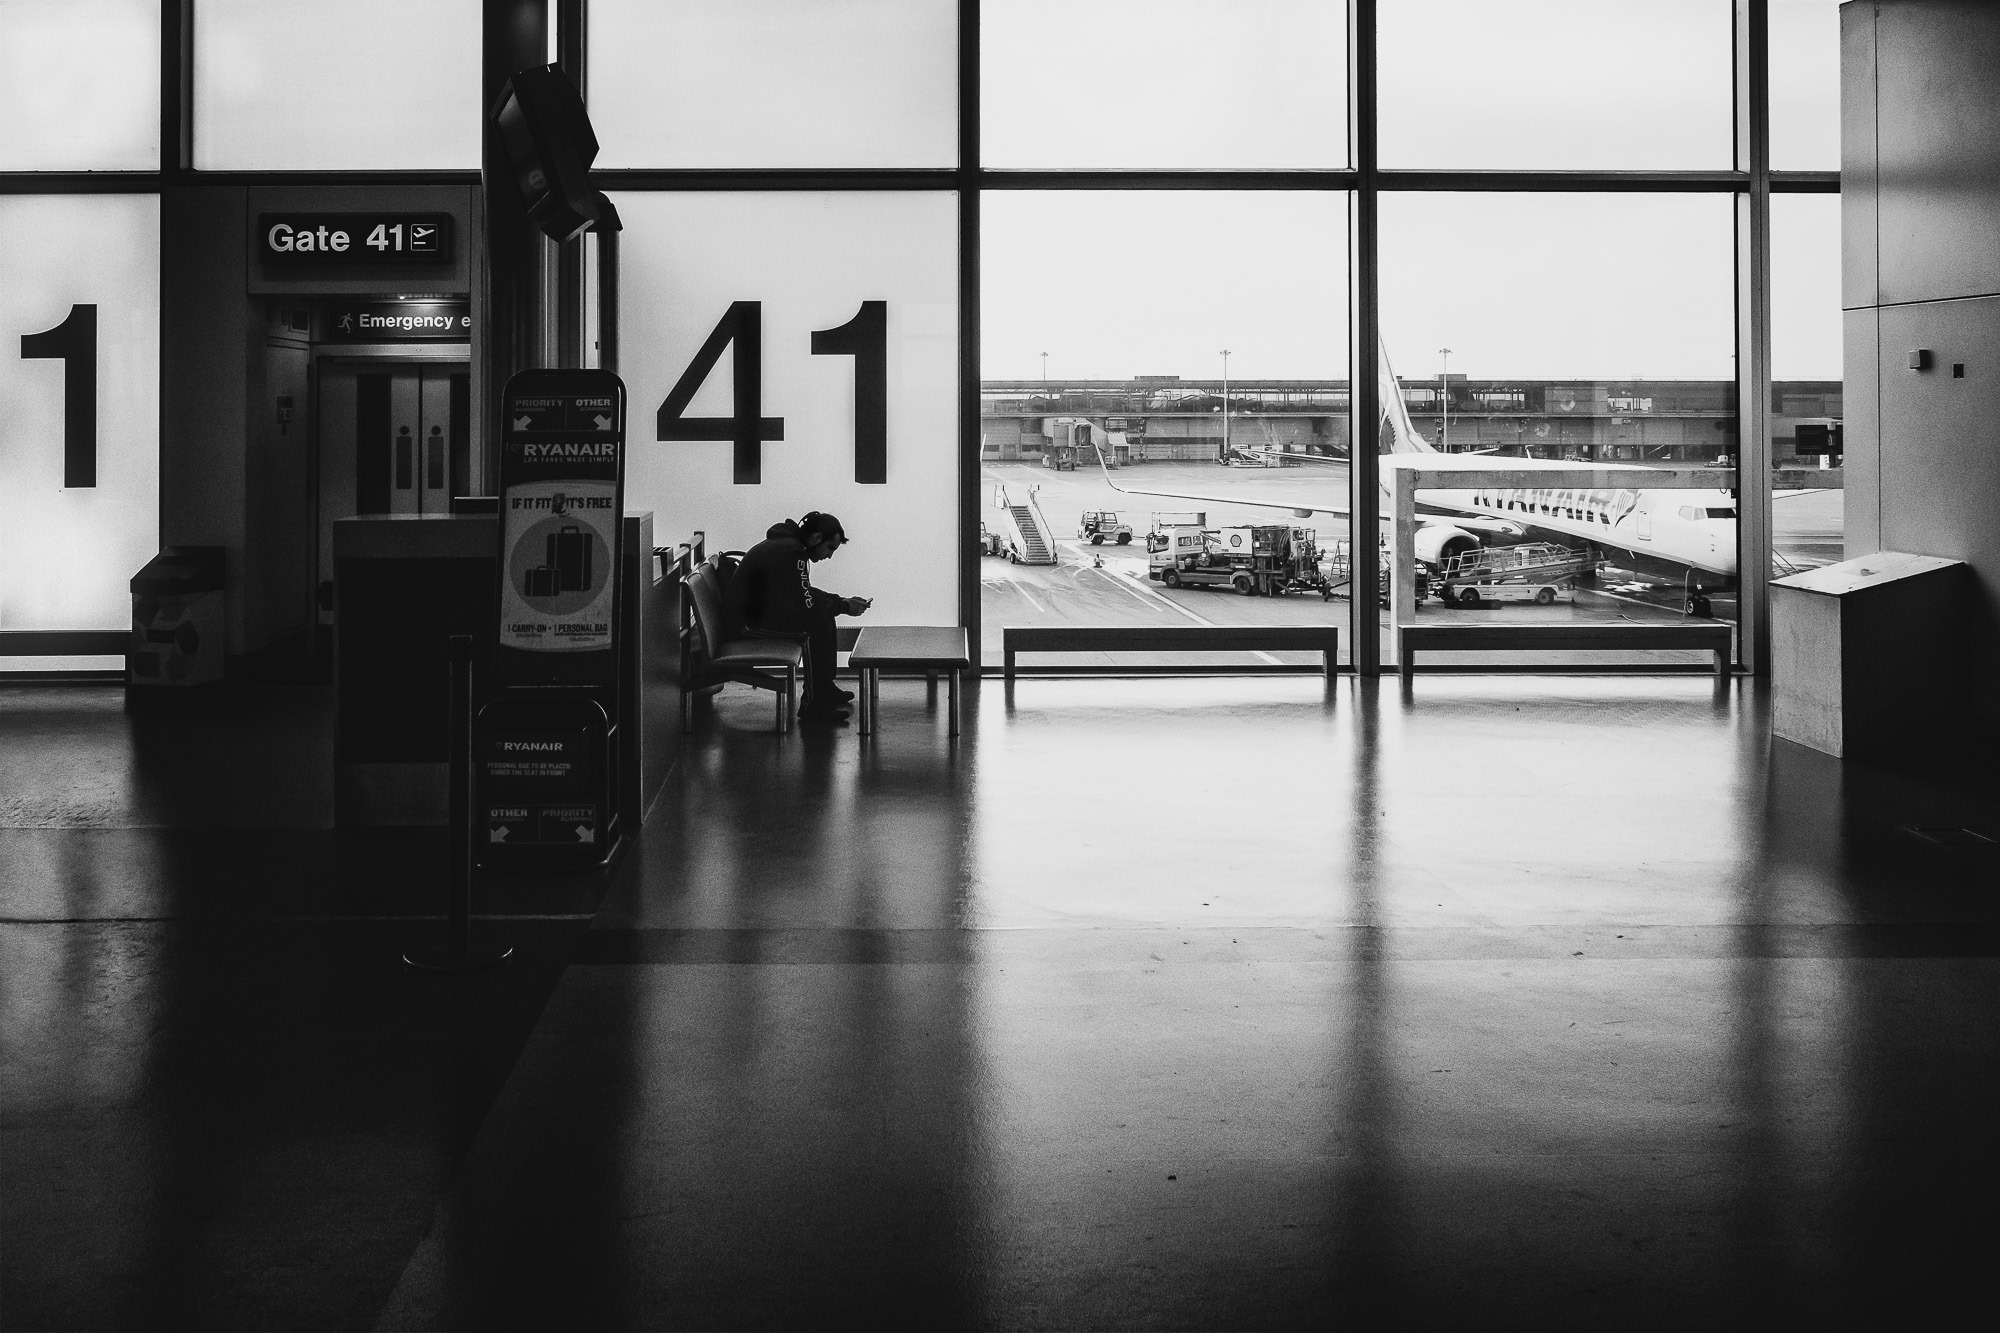 At Gate 41